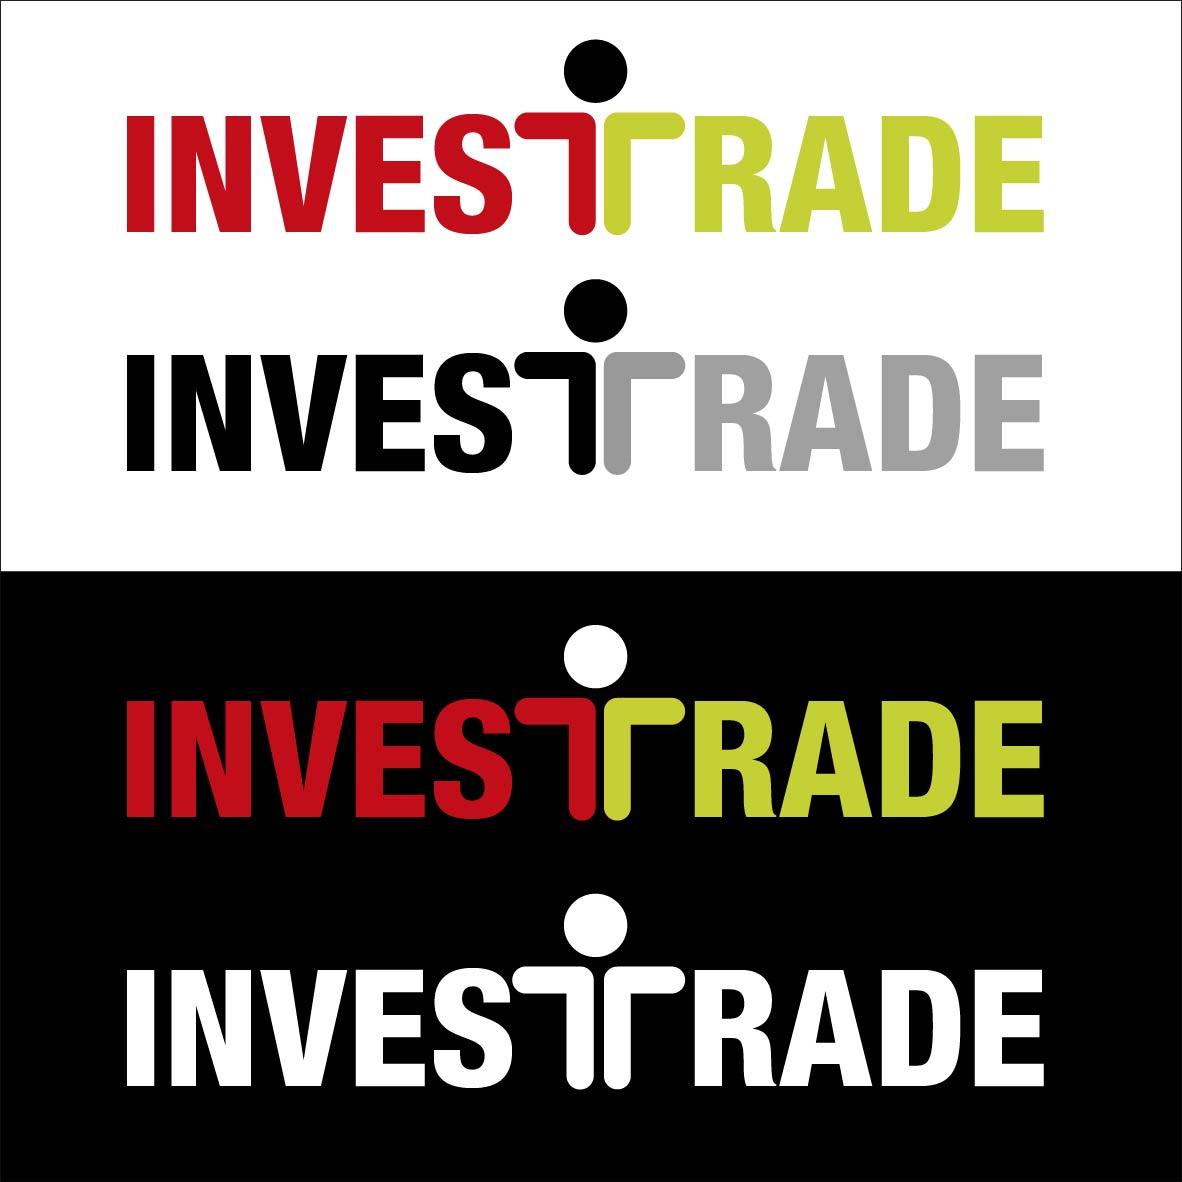 Разработка логотипа для компании Invest trade фото f_205512159a069890.jpg